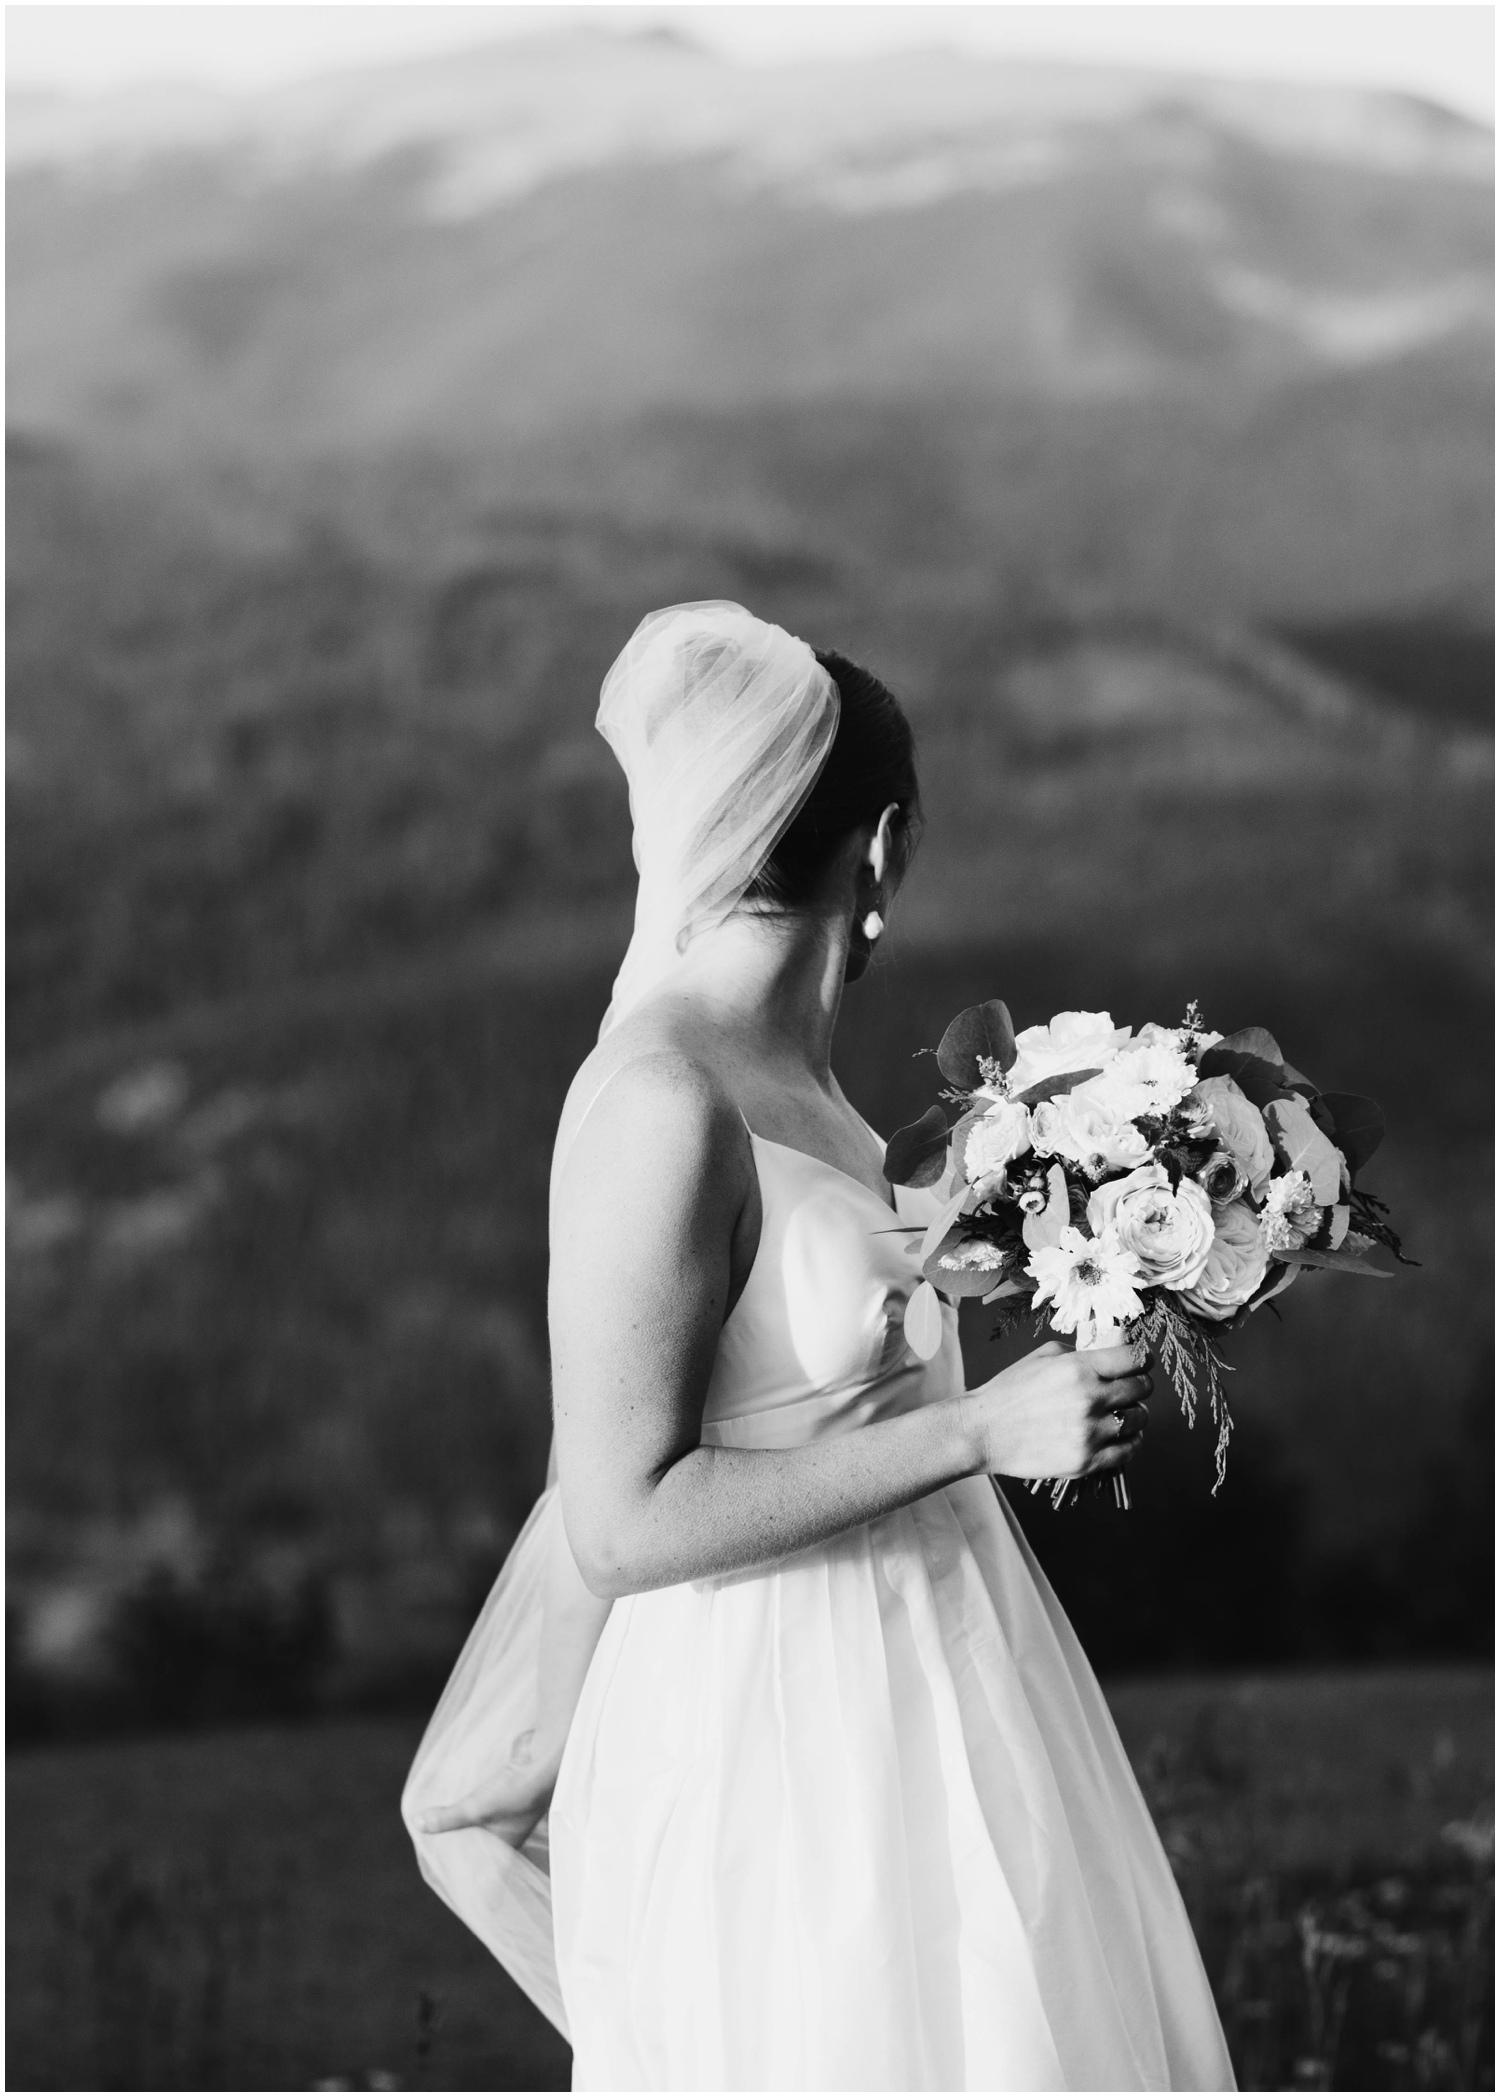 NadegeandJoe_elegant_winter_park_wedding_lodge_at_sunspot_mountain_taylor_powers_0211.jpg